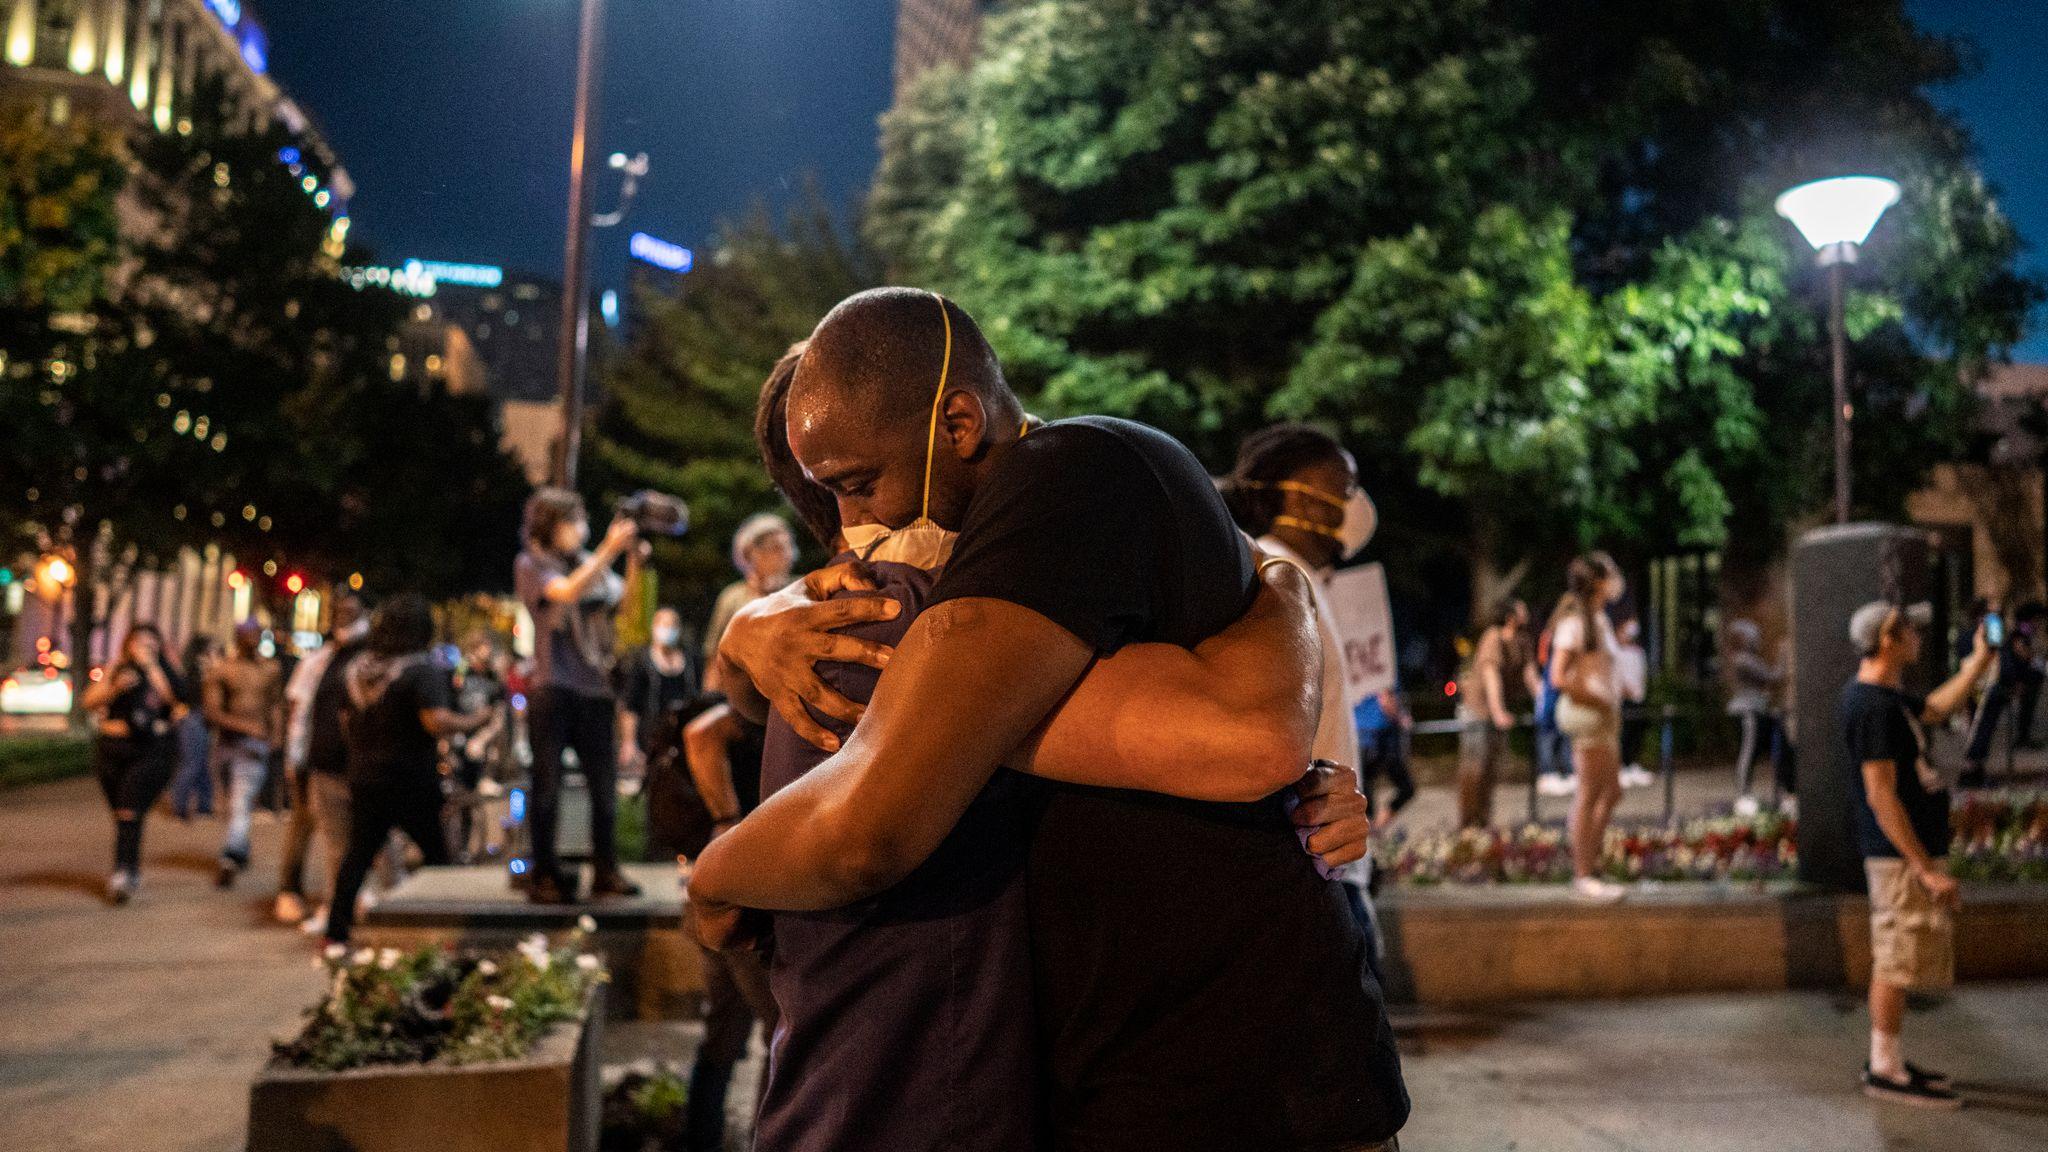 Nashville, Tenn., May 30 - Protestors hug in Nashville Public Square. (Photo: John Partipilo)